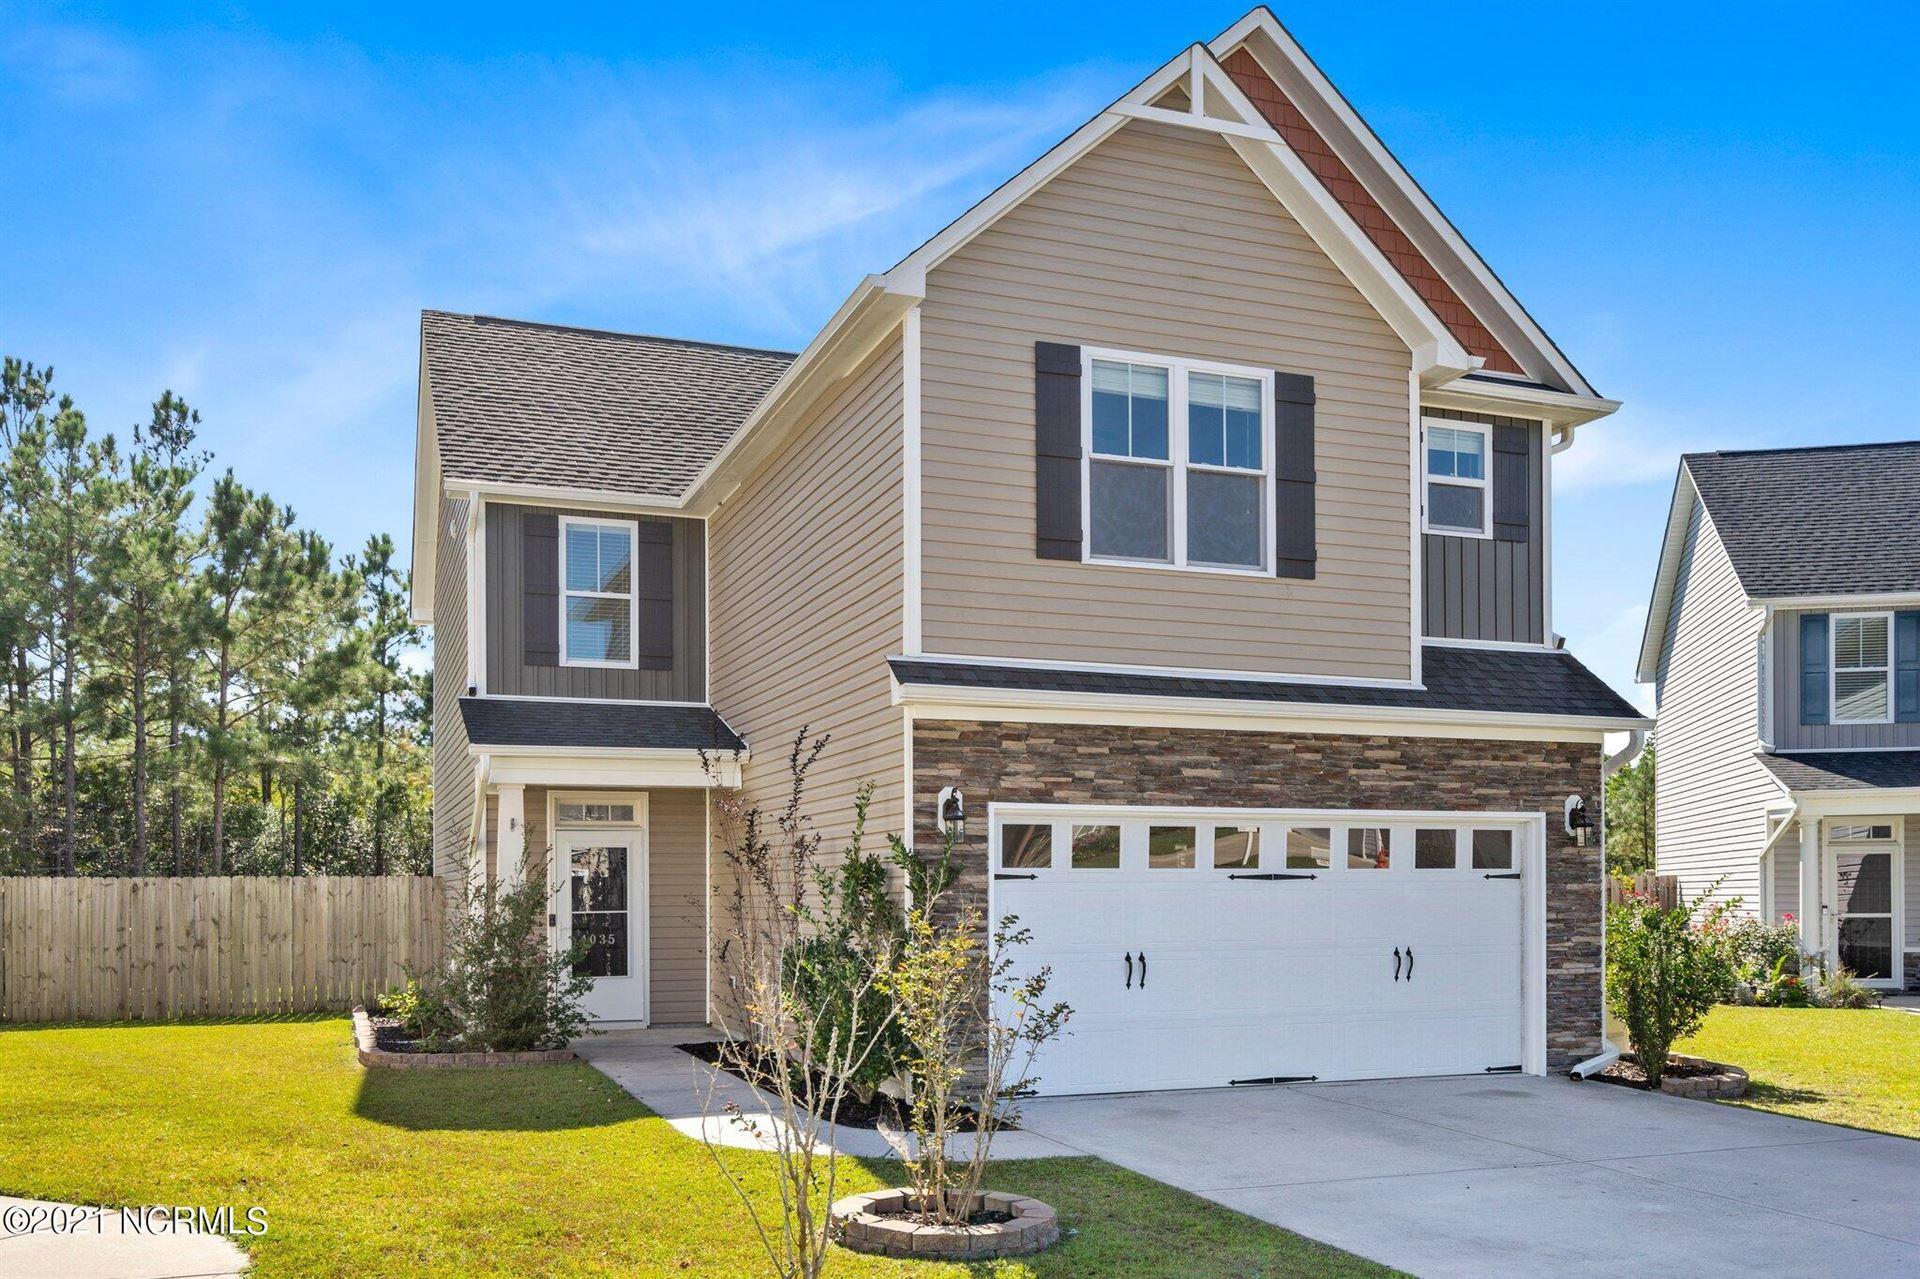 Photo of 4035 Darrow Drive, Leland, NC 28451 (MLS # 100295229)